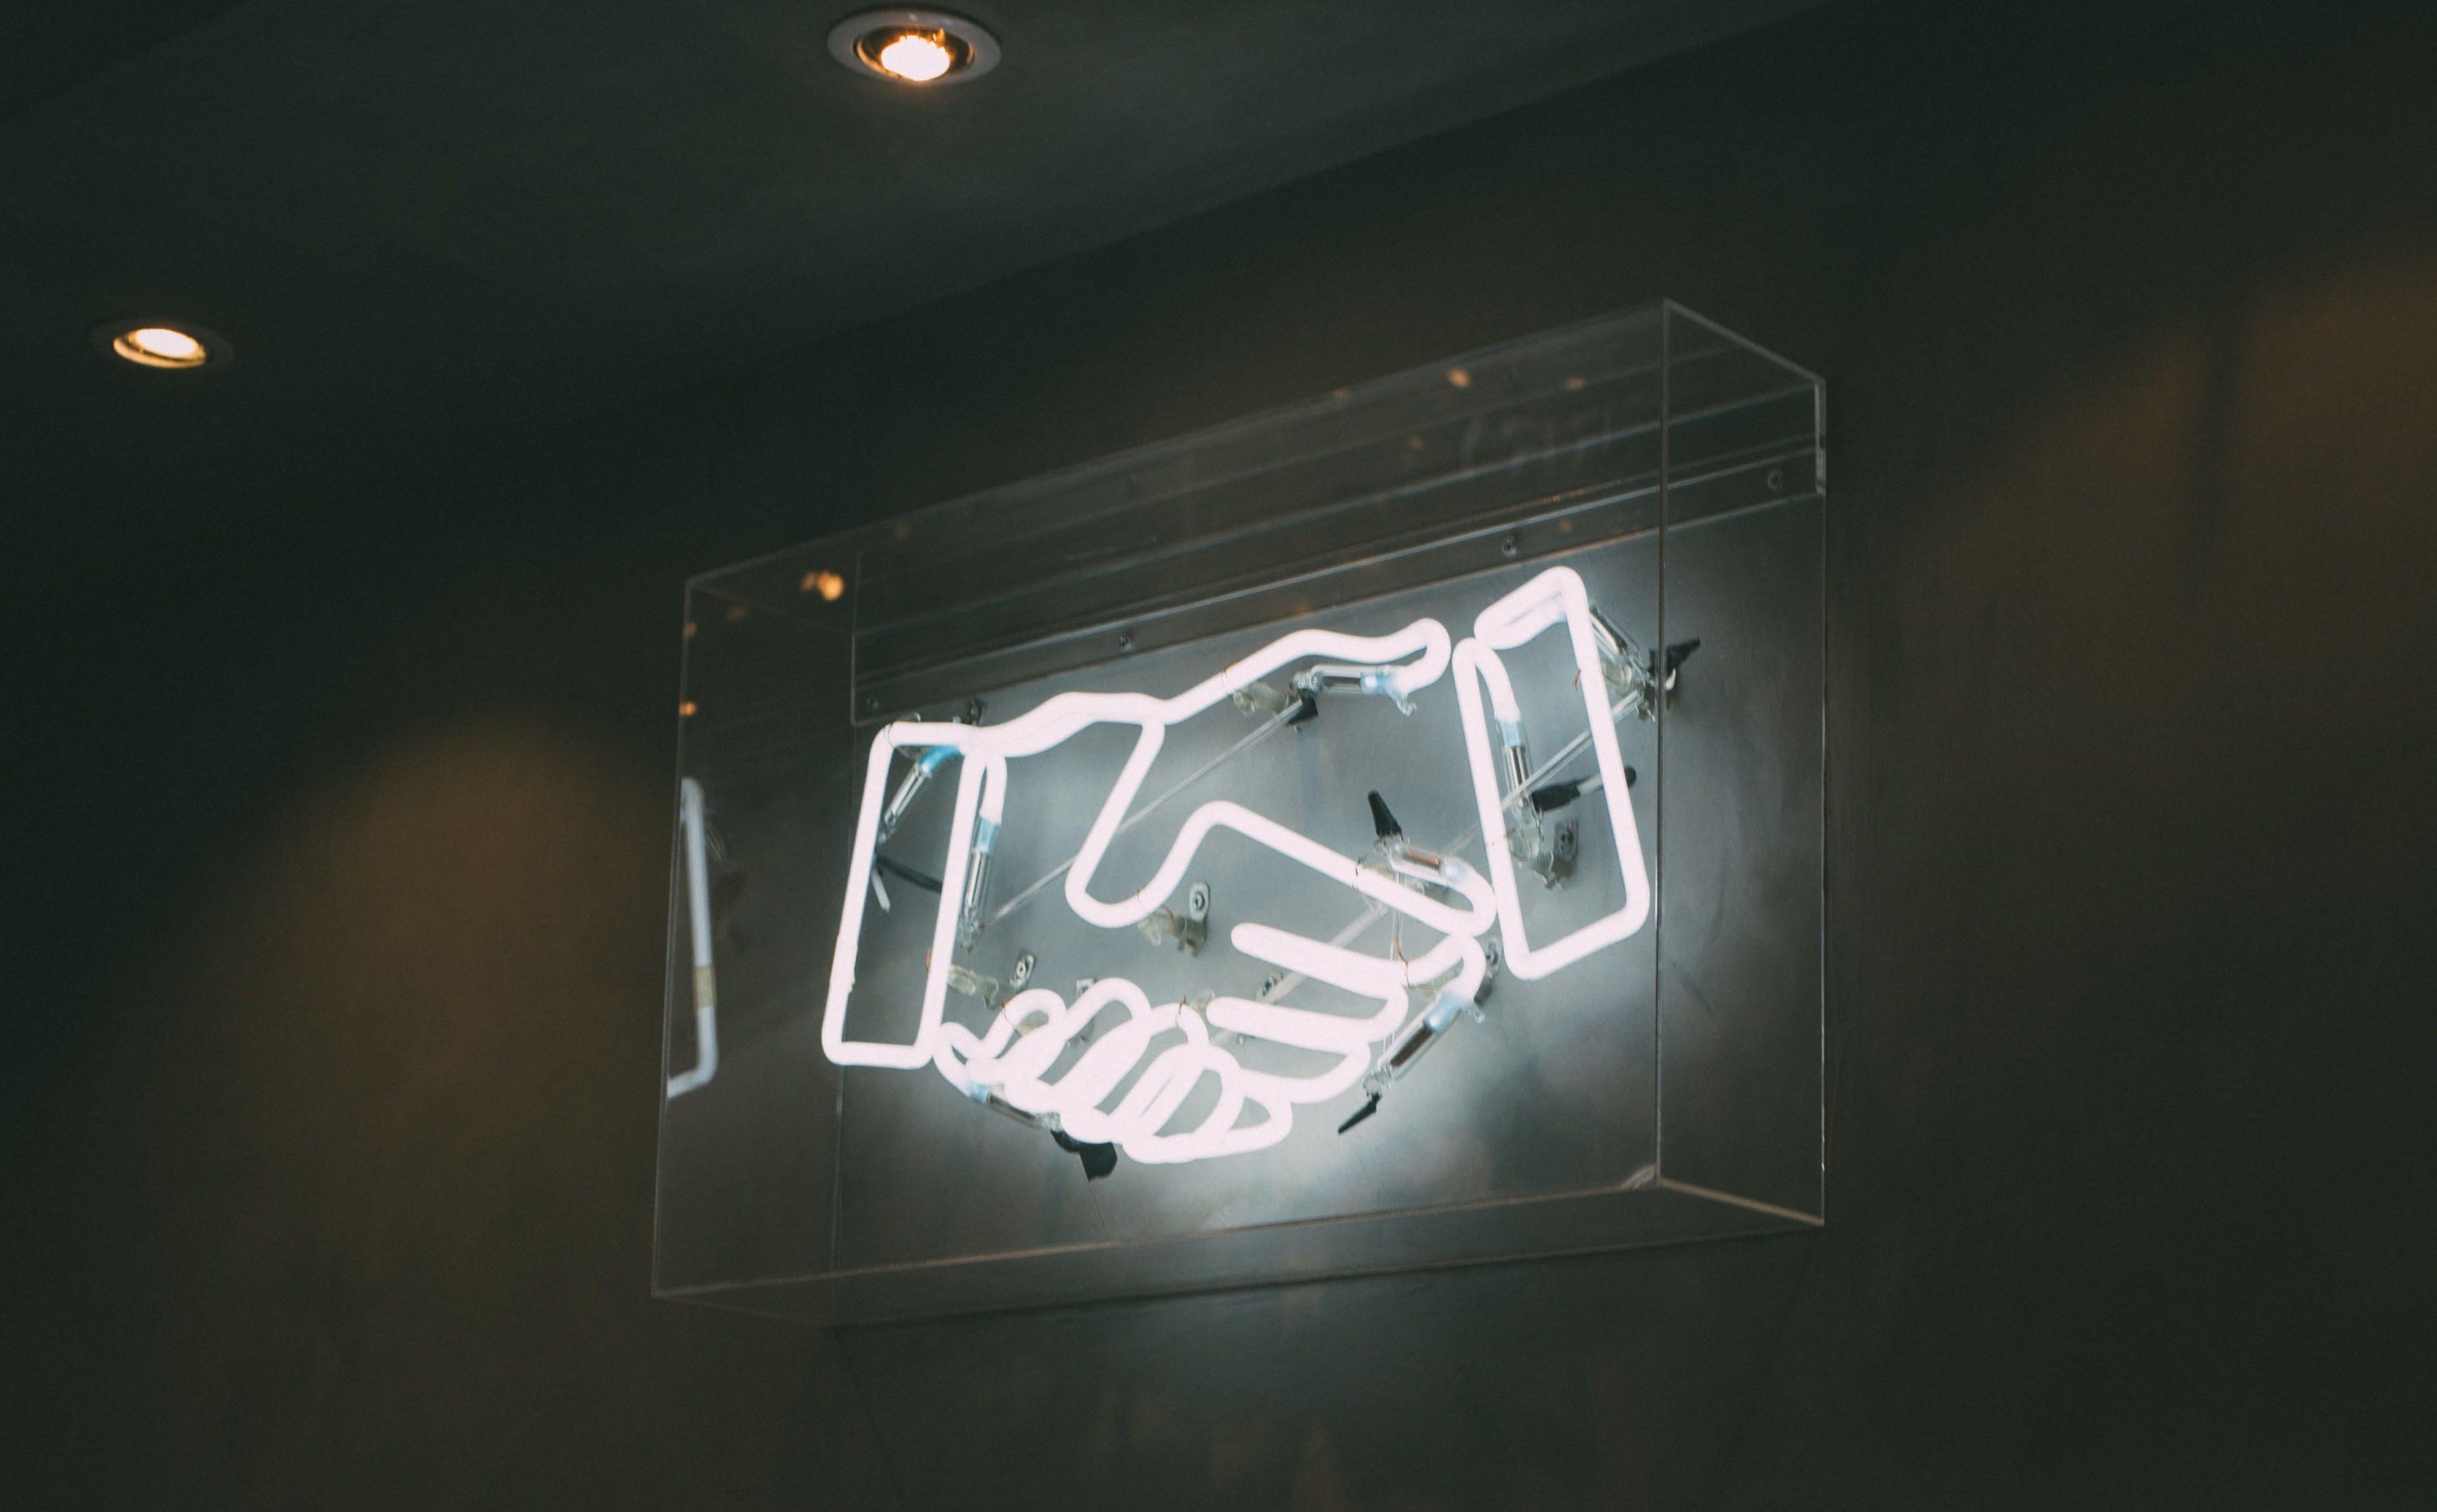 neon sign of shaking hands